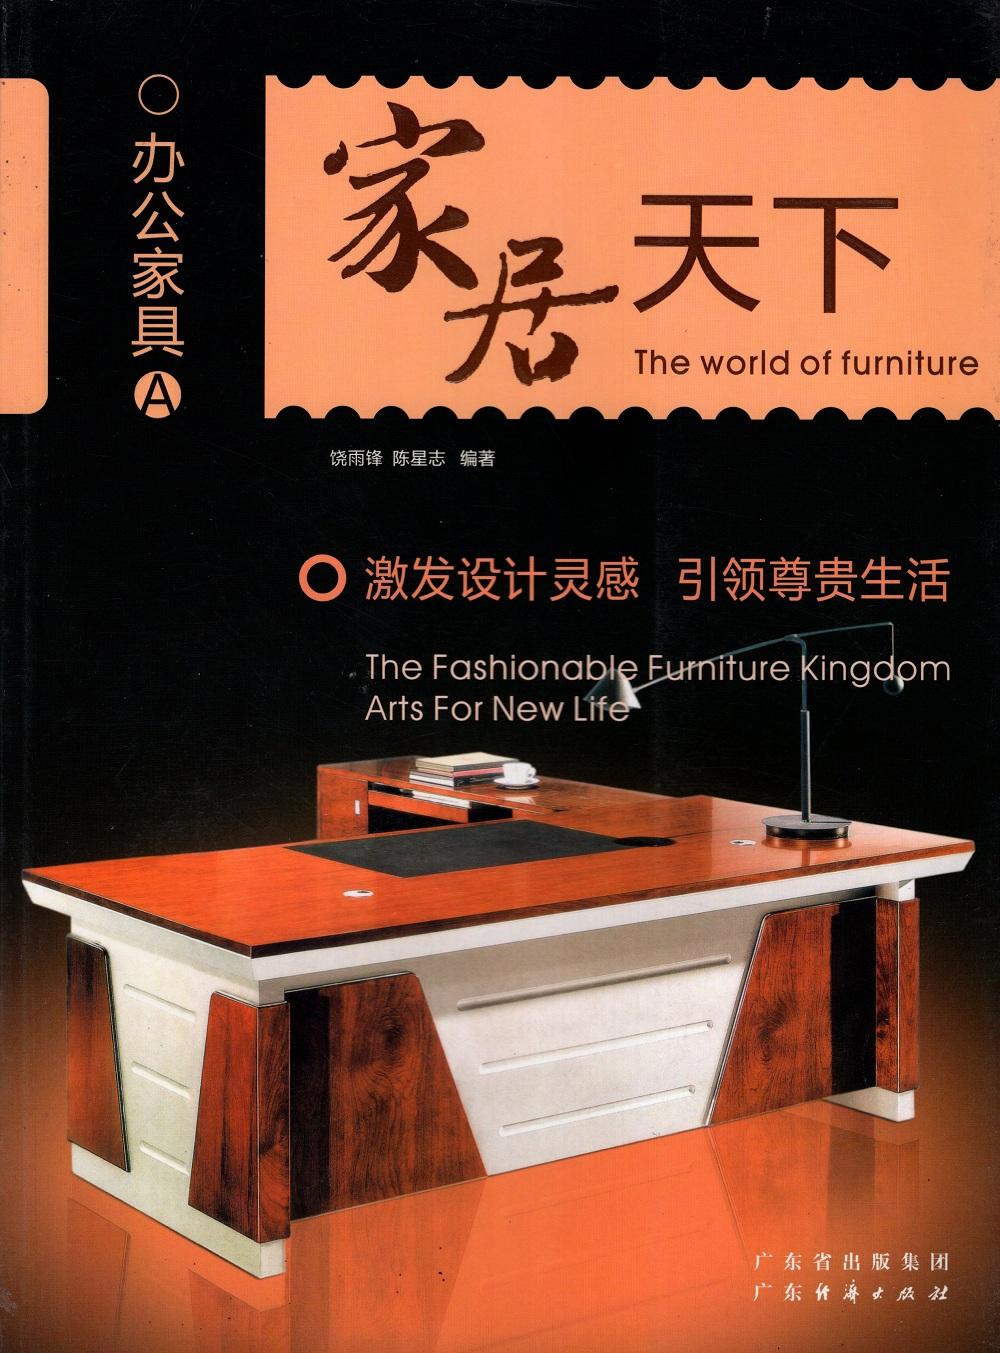 Cataloge Gỗ 6 Mẫu – The World Of Funiture (Tập 3)